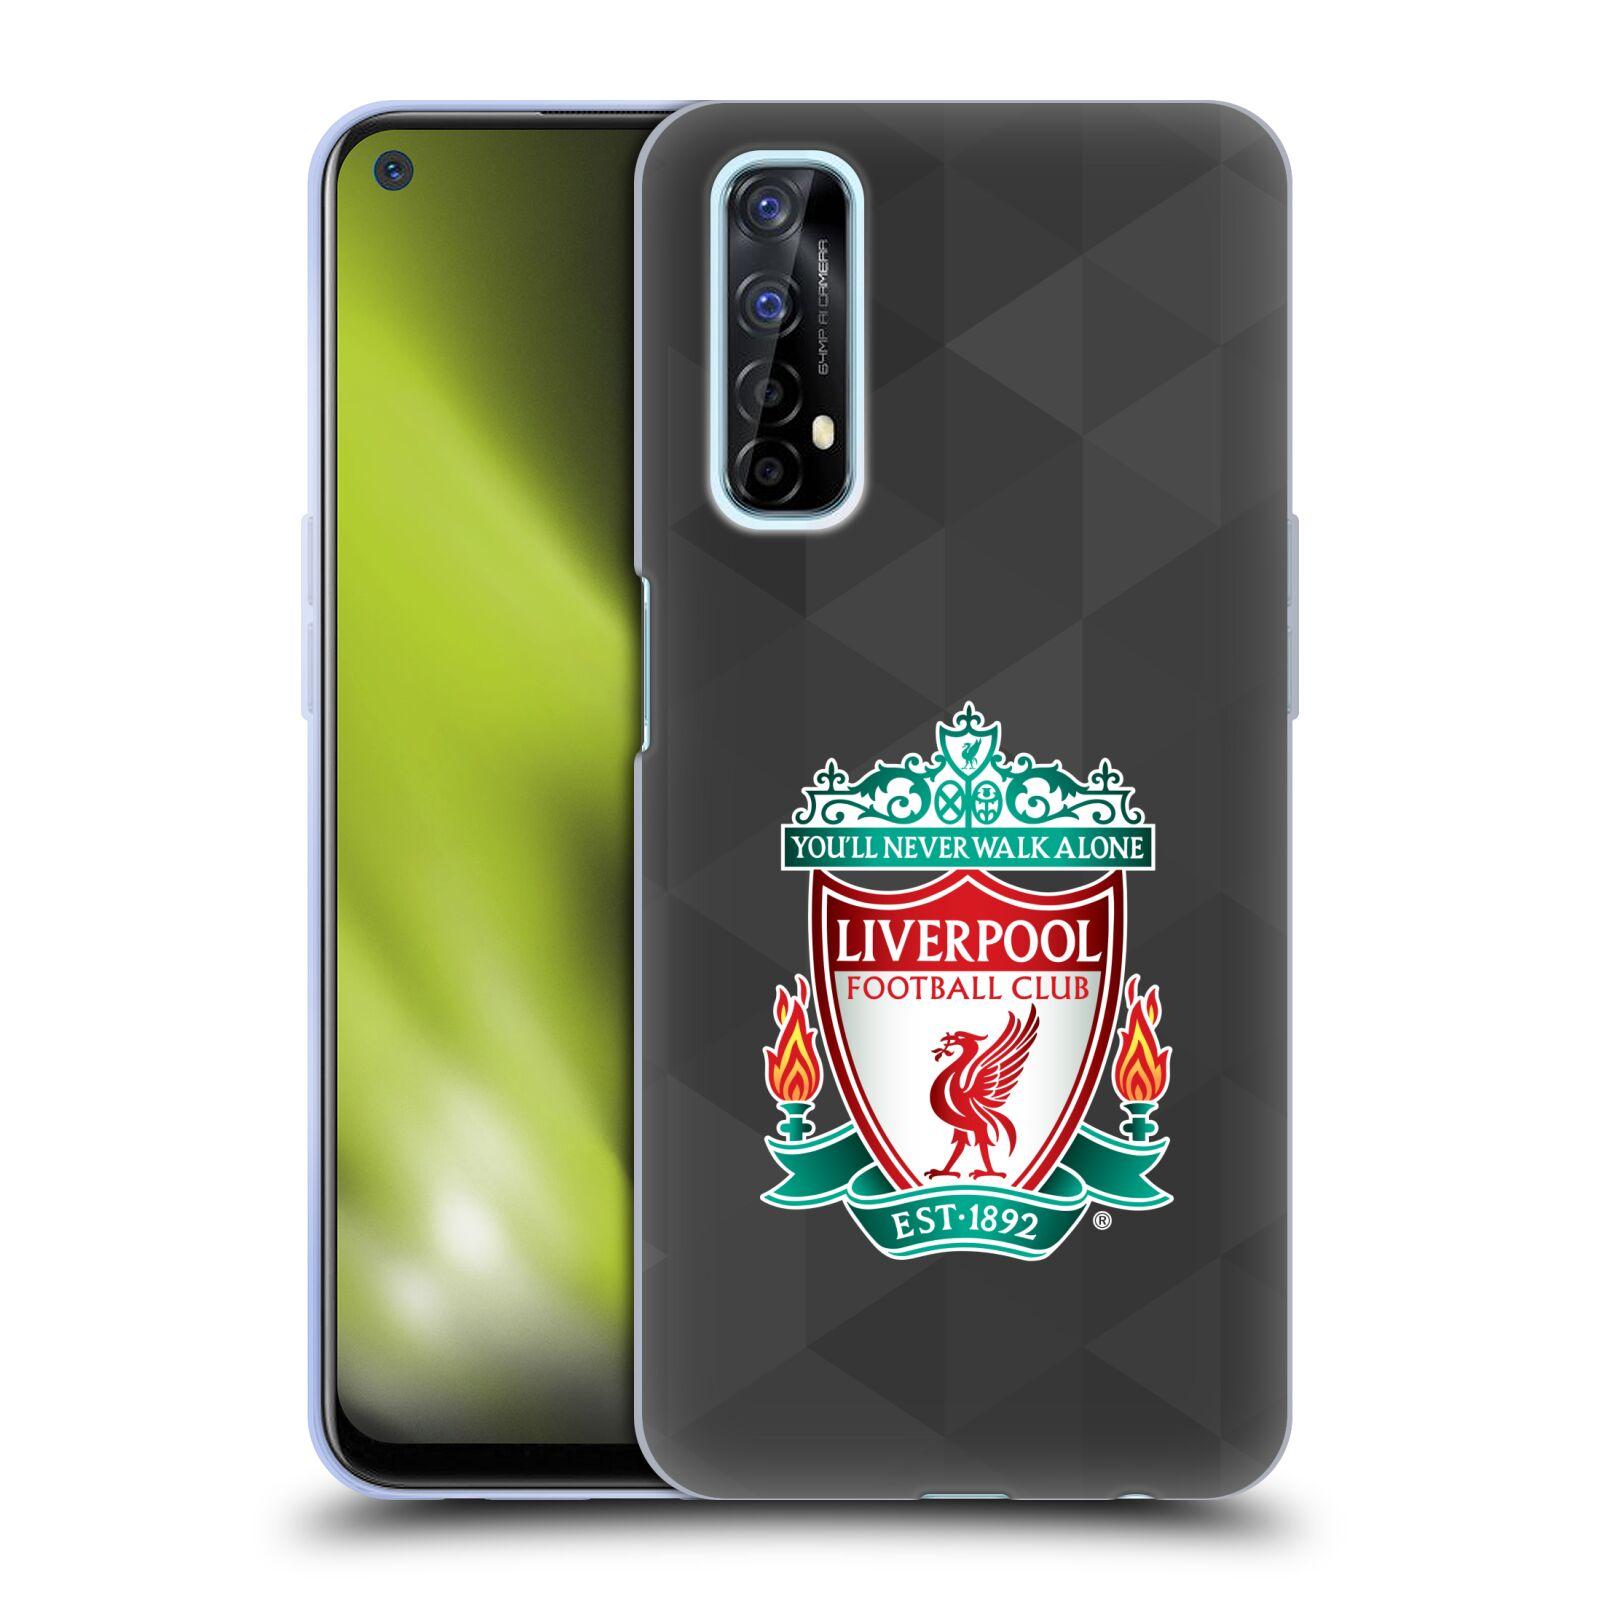 Silikonové pouzdro na mobil Realme 7 - Head Case - ZNAK LIVERPOOL FC OFFICIAL GEOMETRIC BLACK